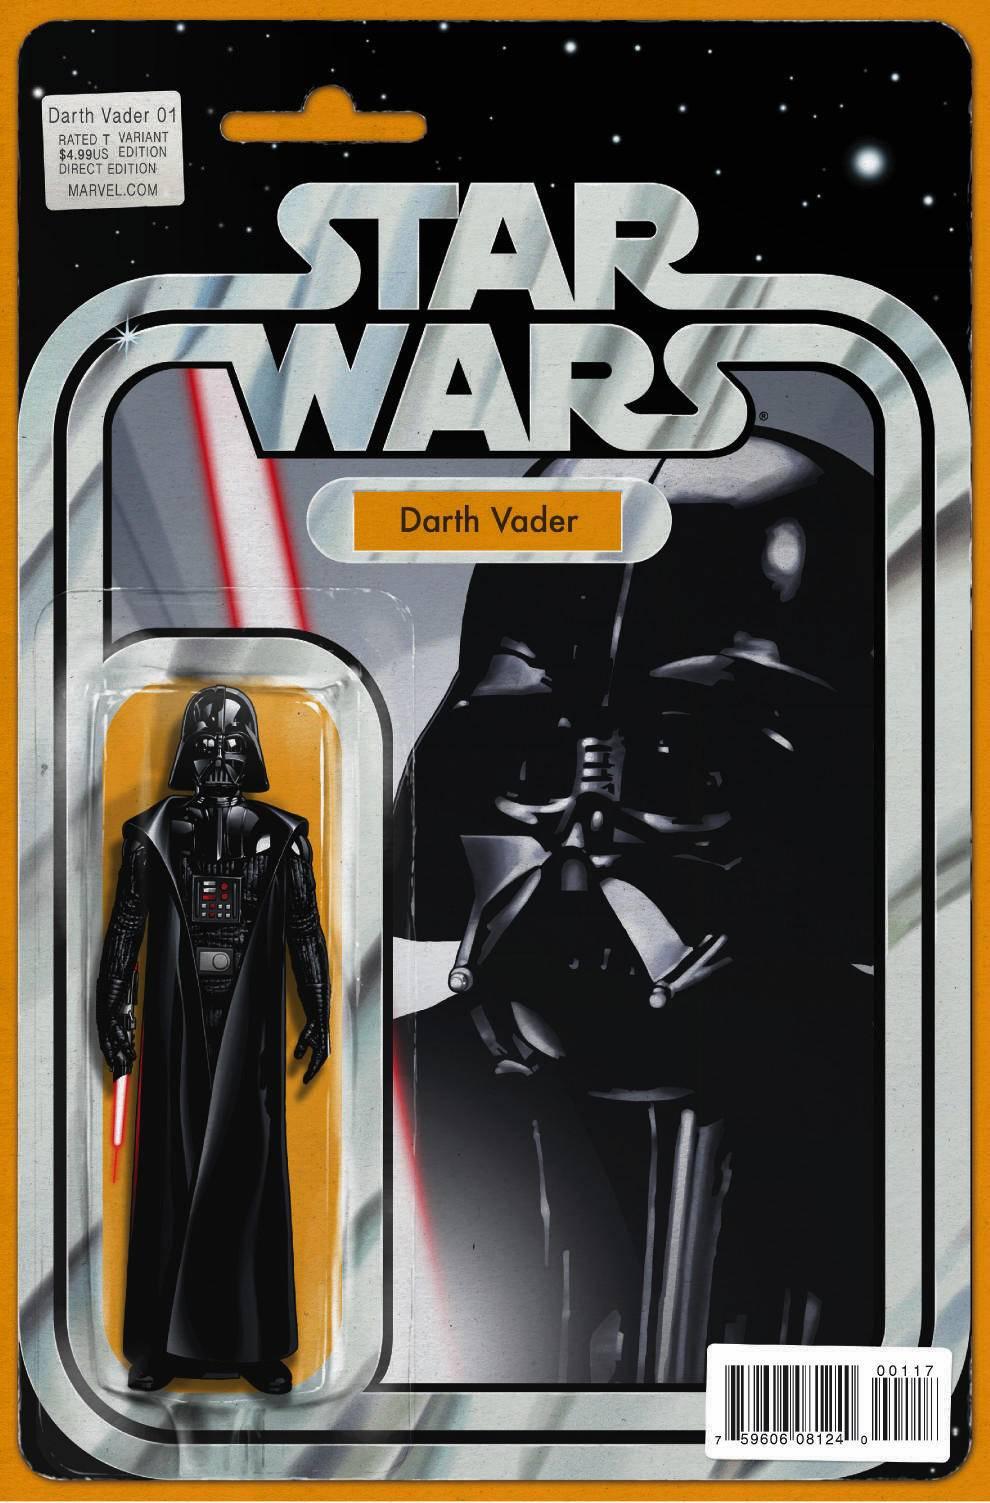 Star_Wars_Darth_Vader_Vol_1_1_Action_Figure_A_Variant